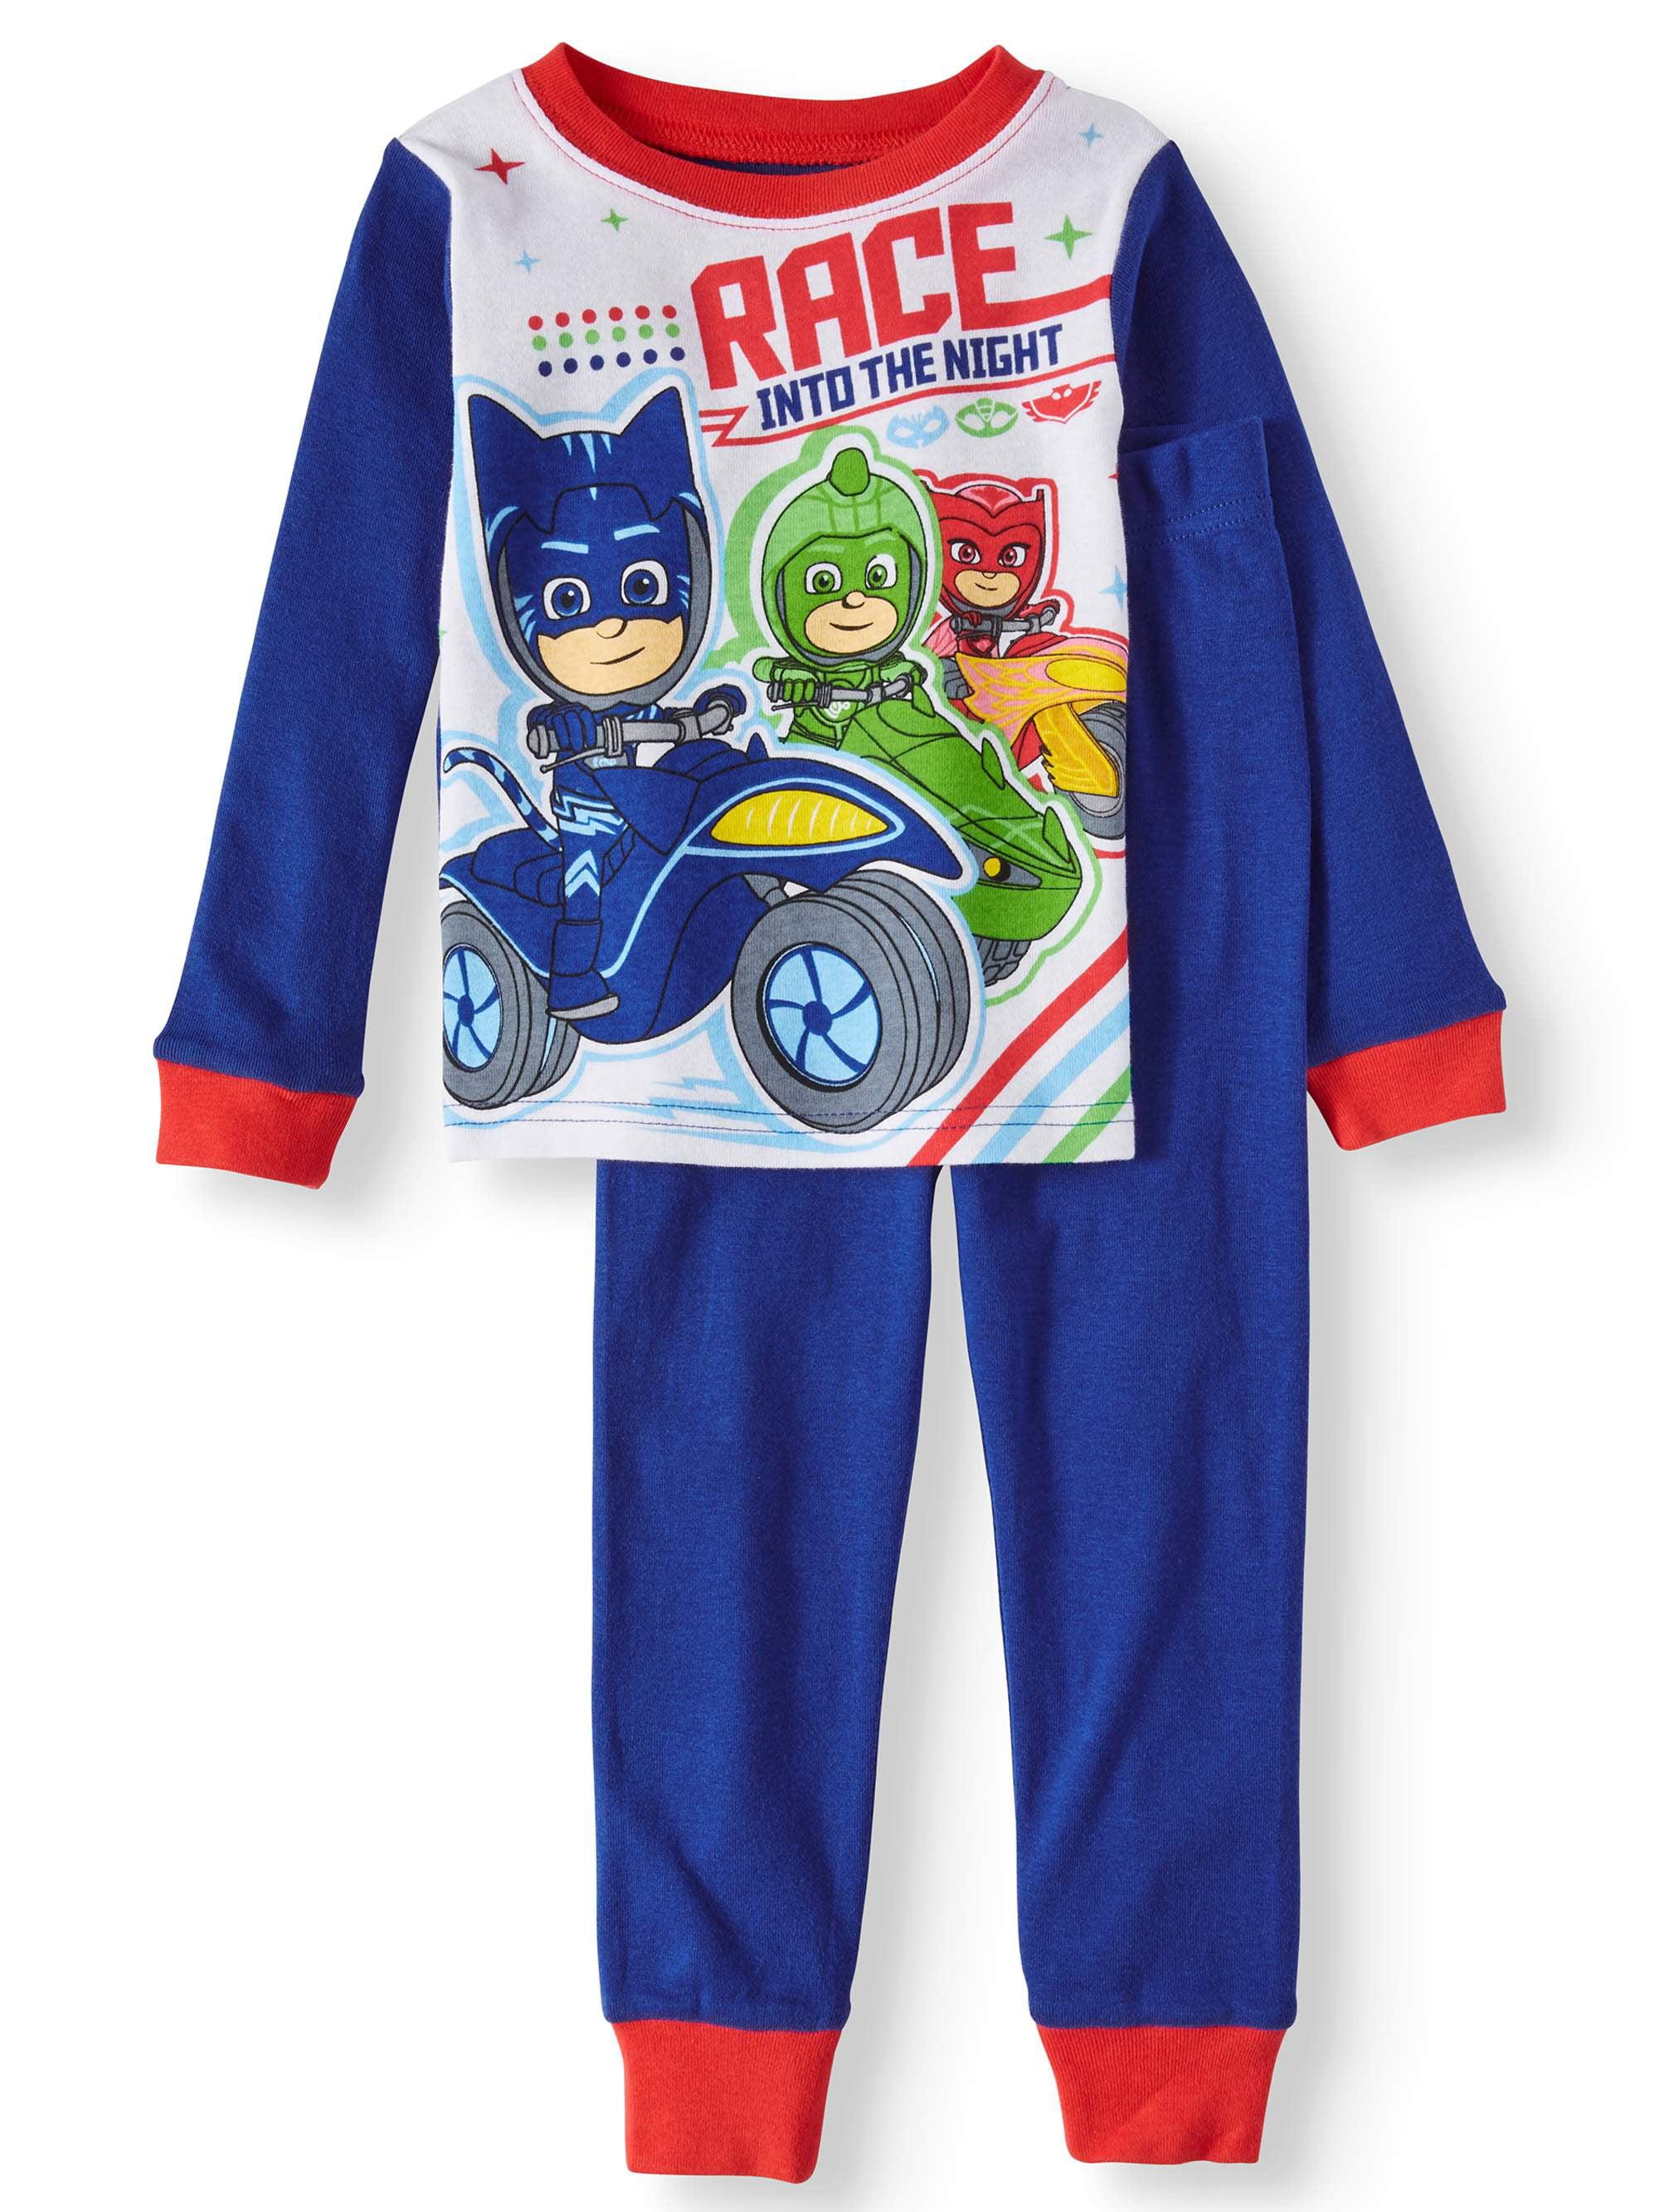 Boys PJ Masks Into The Night to Save The Day Snuggle Fit Pyjamas